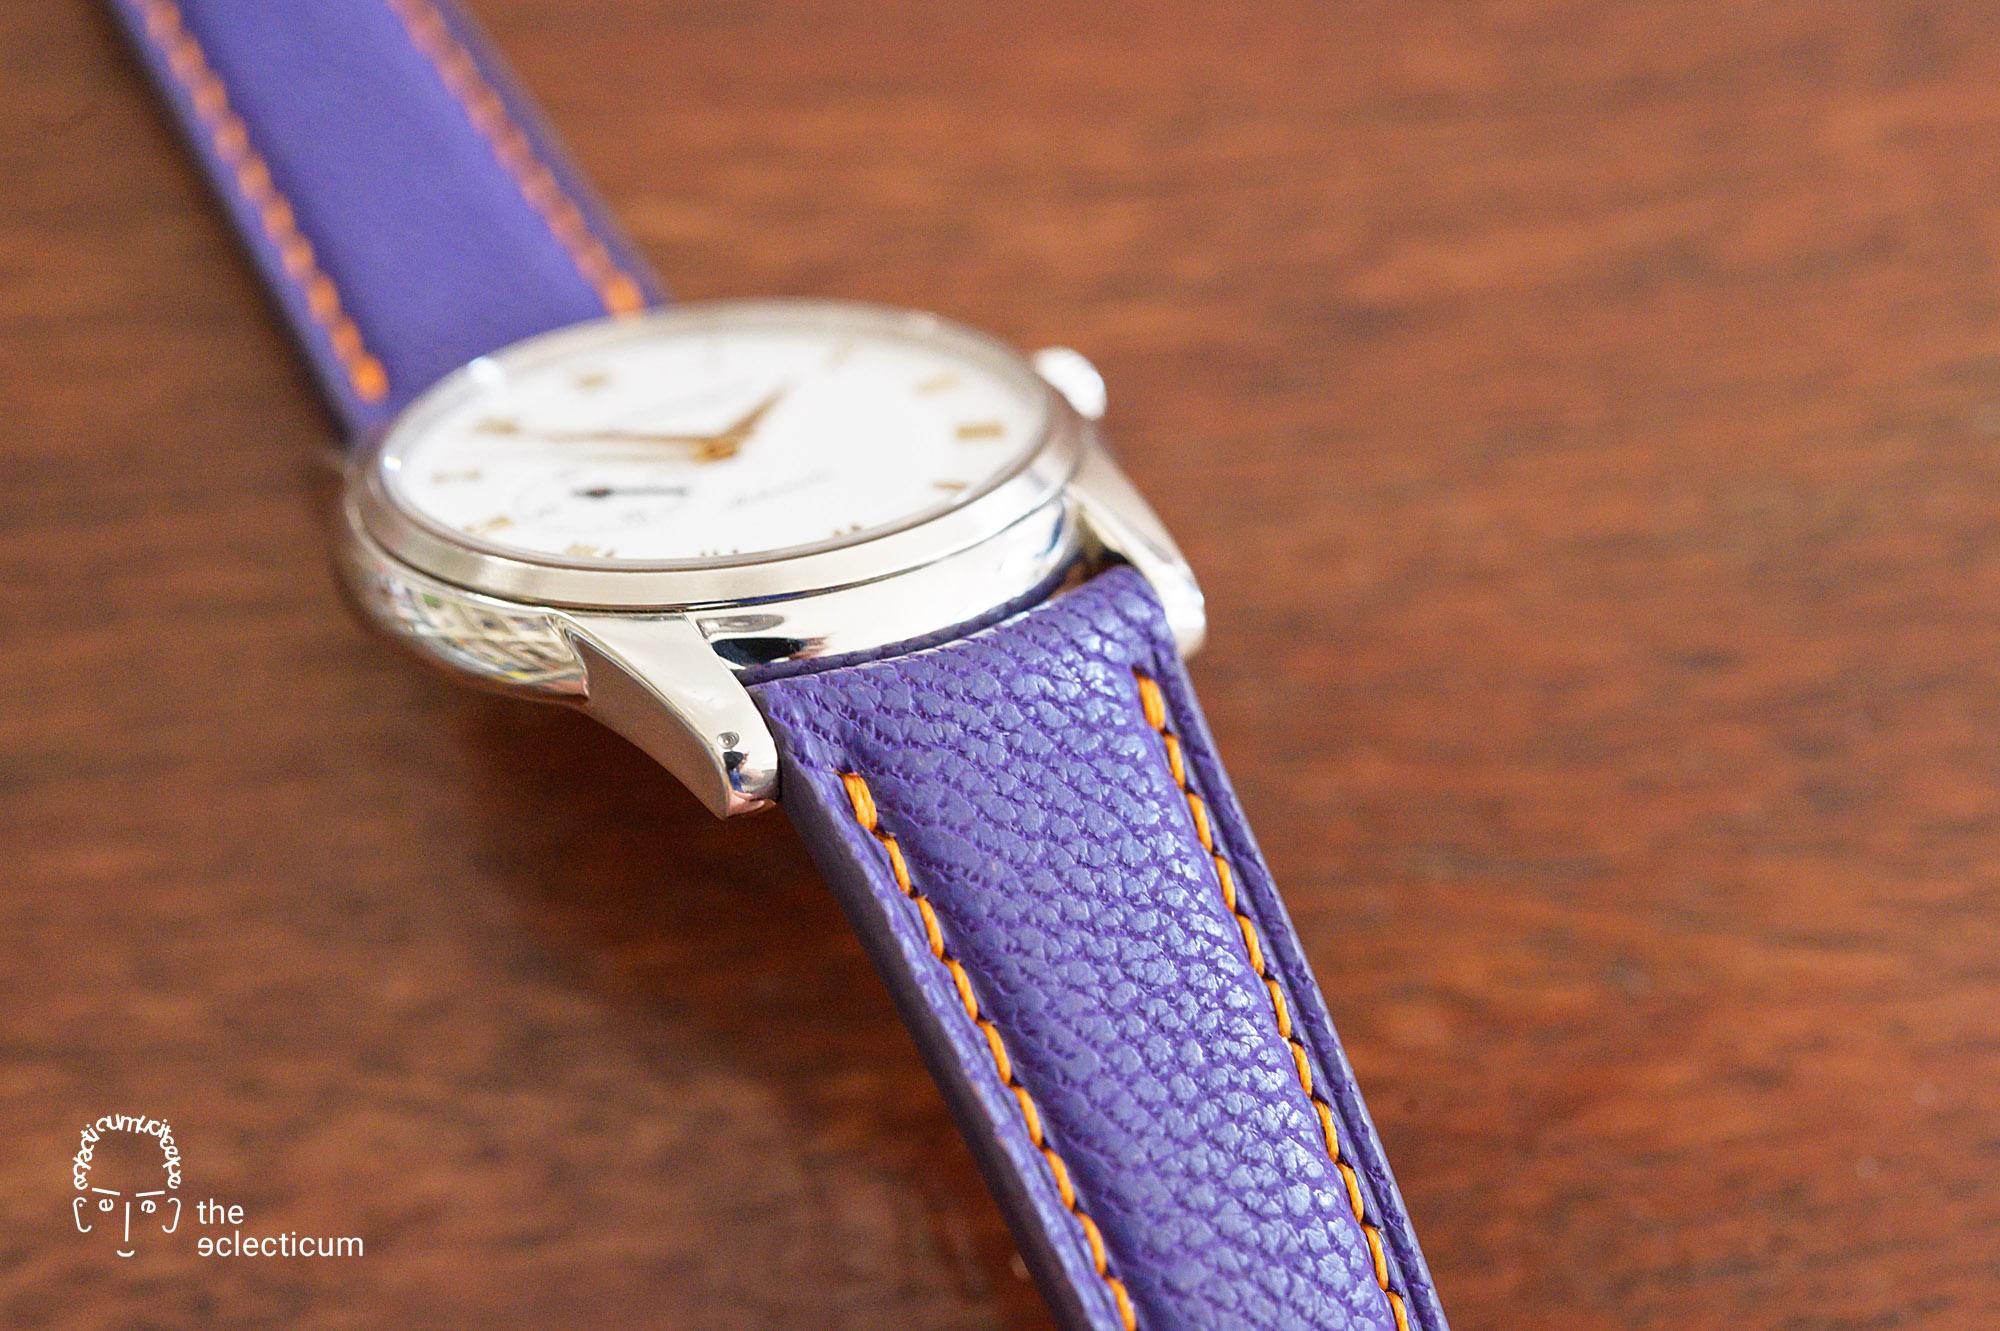 Girard Perregaux Classique Elegance Ref. 90500 Heima bepsoke strap japanese goat leather